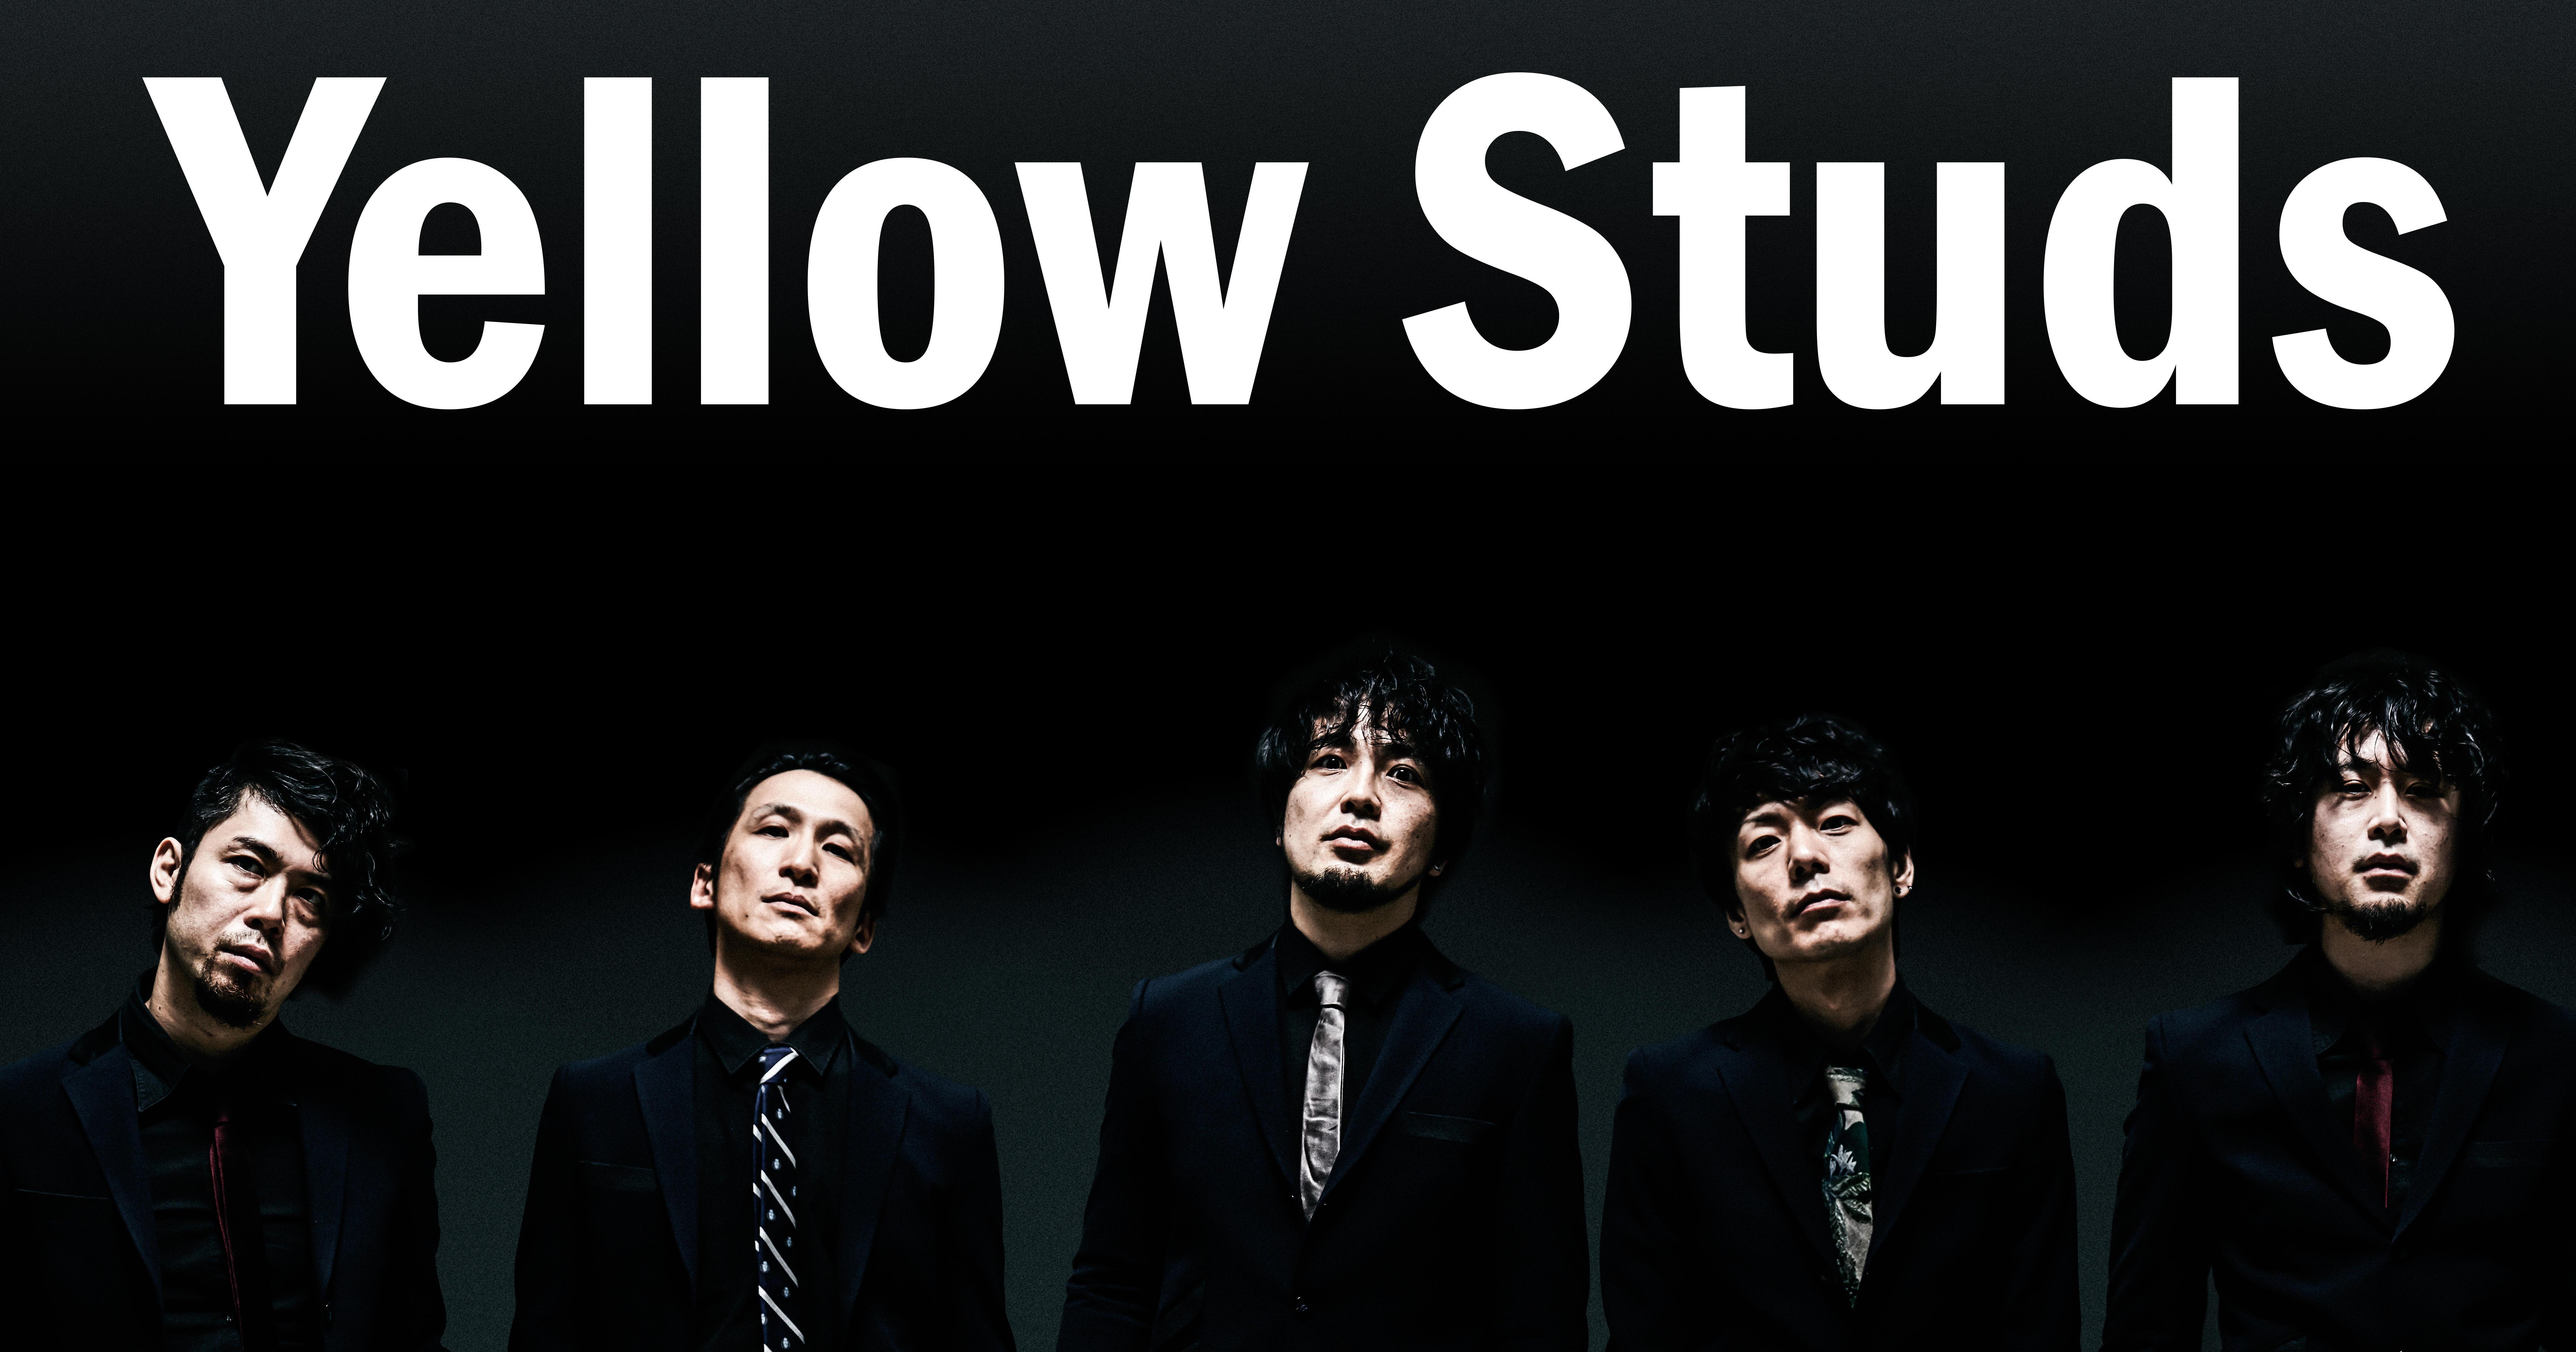 Yellow Studs / アシュラシンドローム / and more